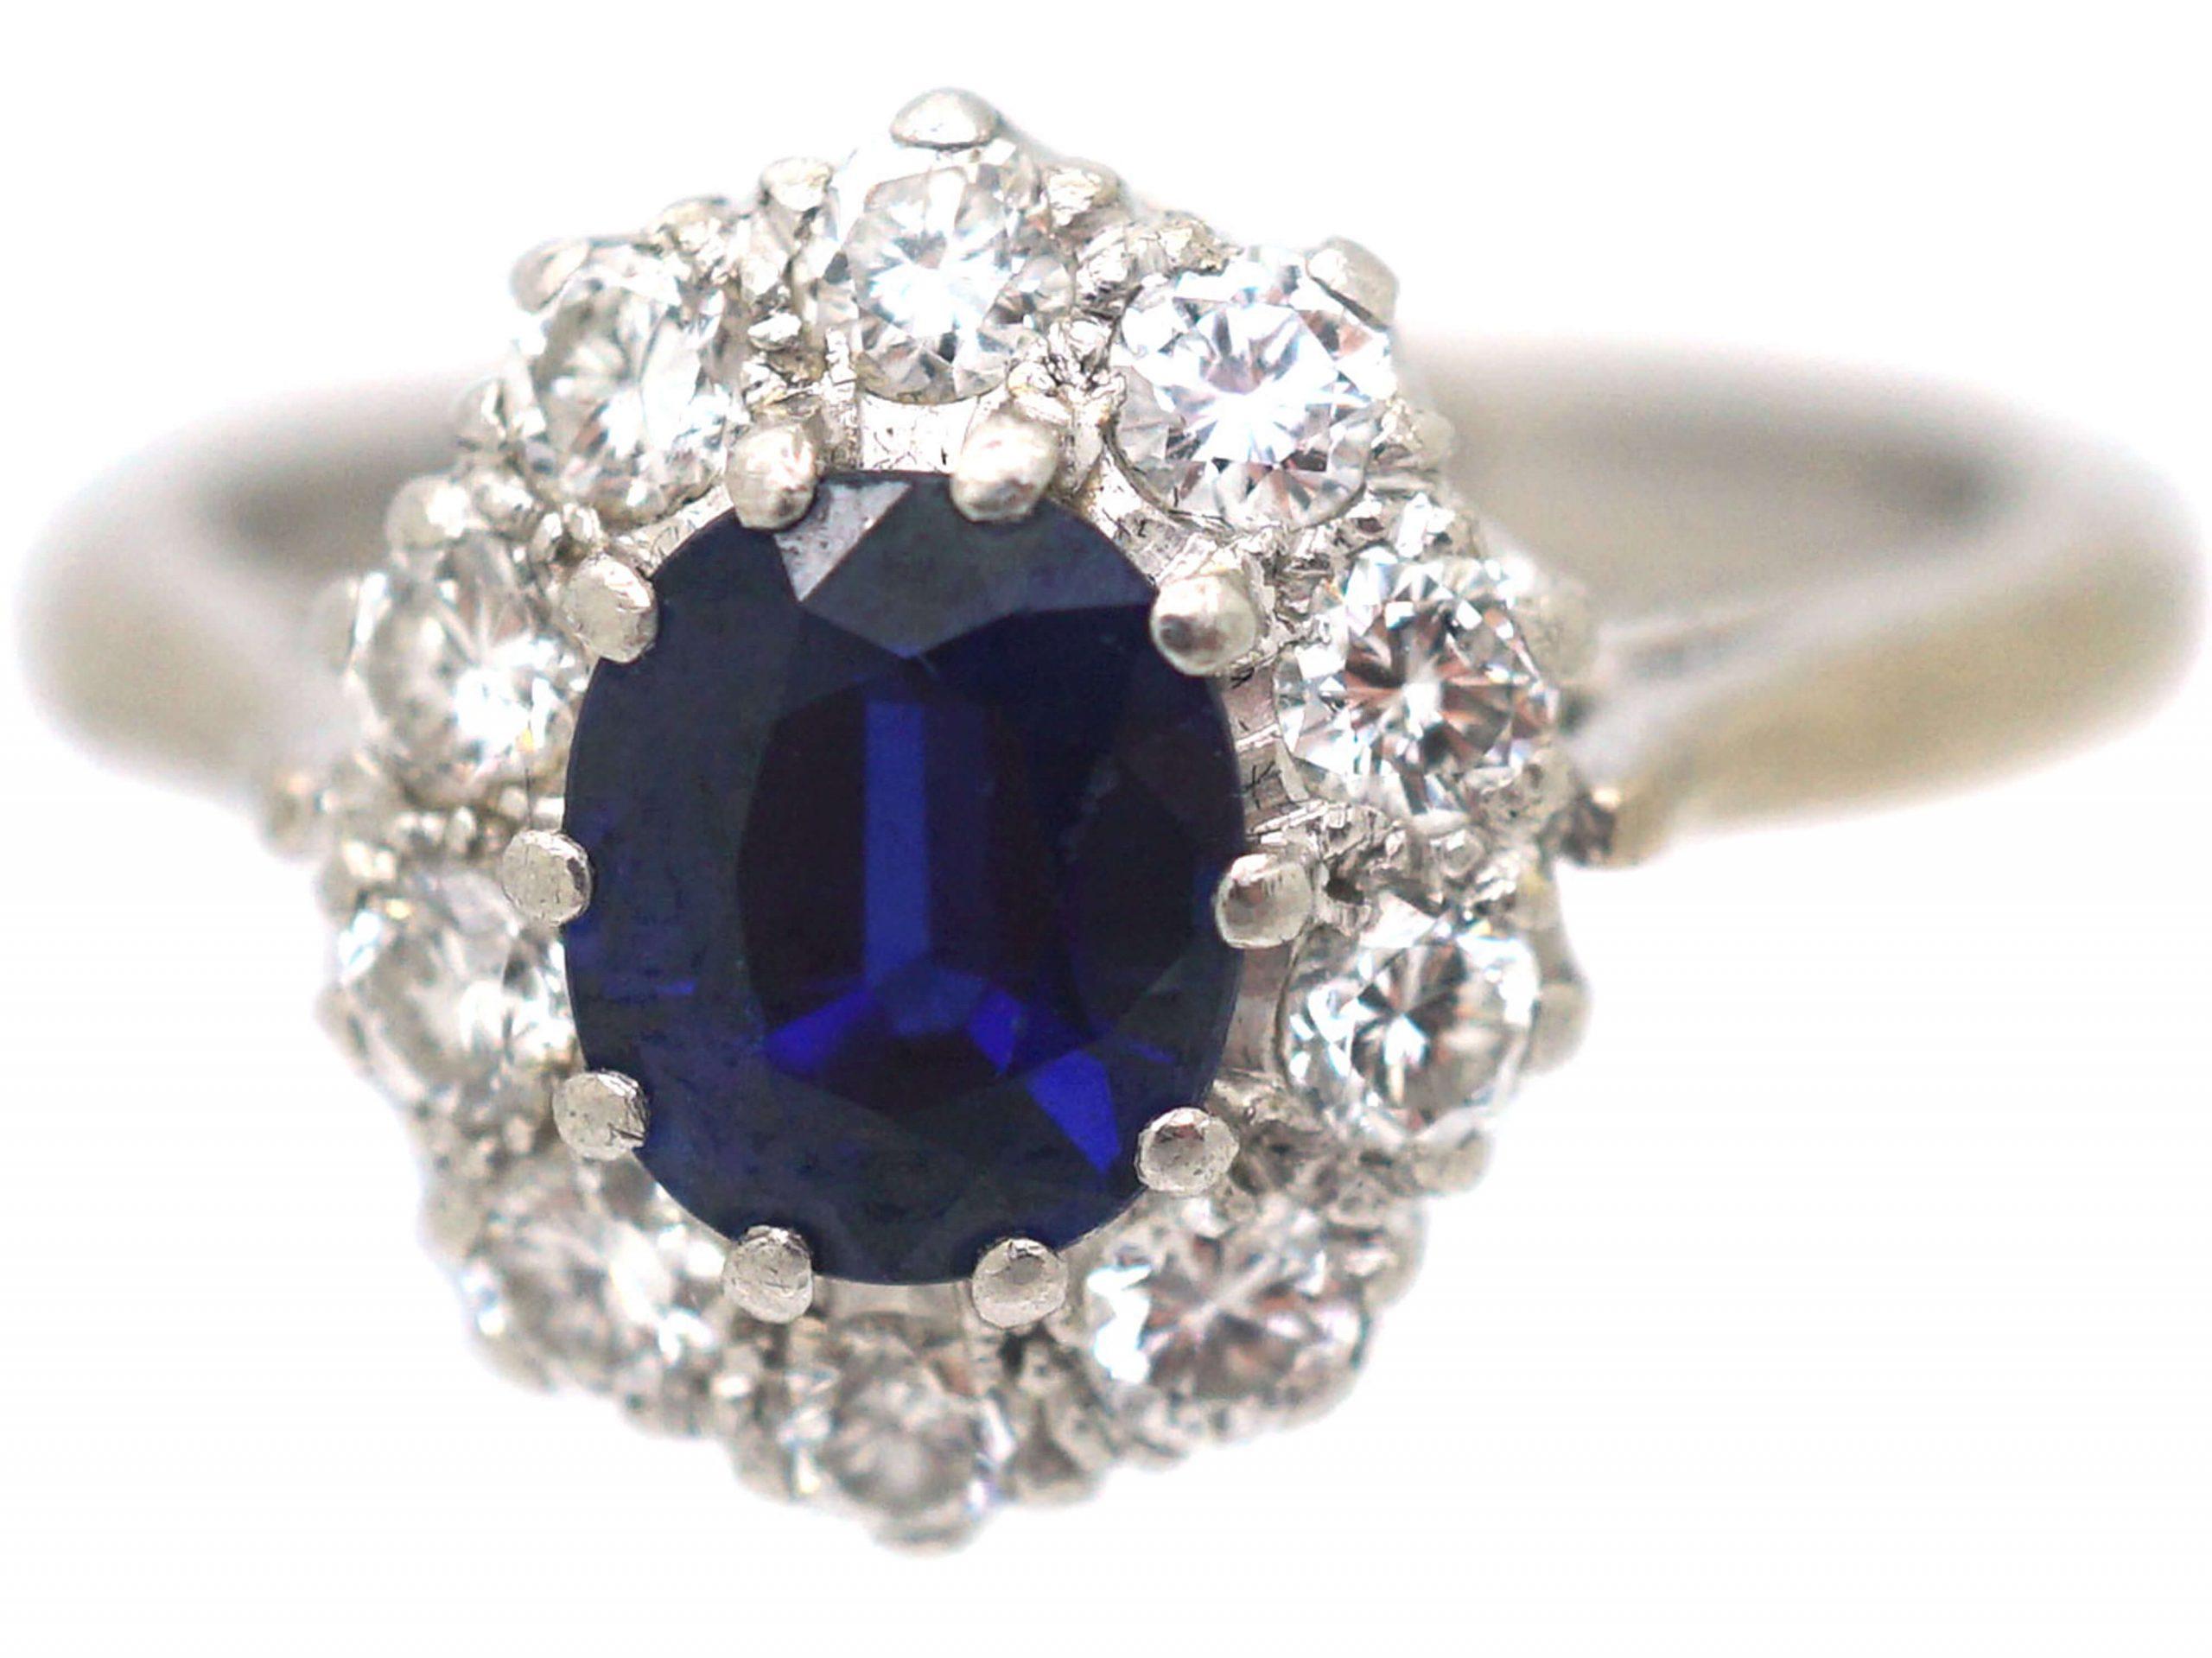 18ct White Gold & Platinum, Sapphire & Diamond Cluster Ring